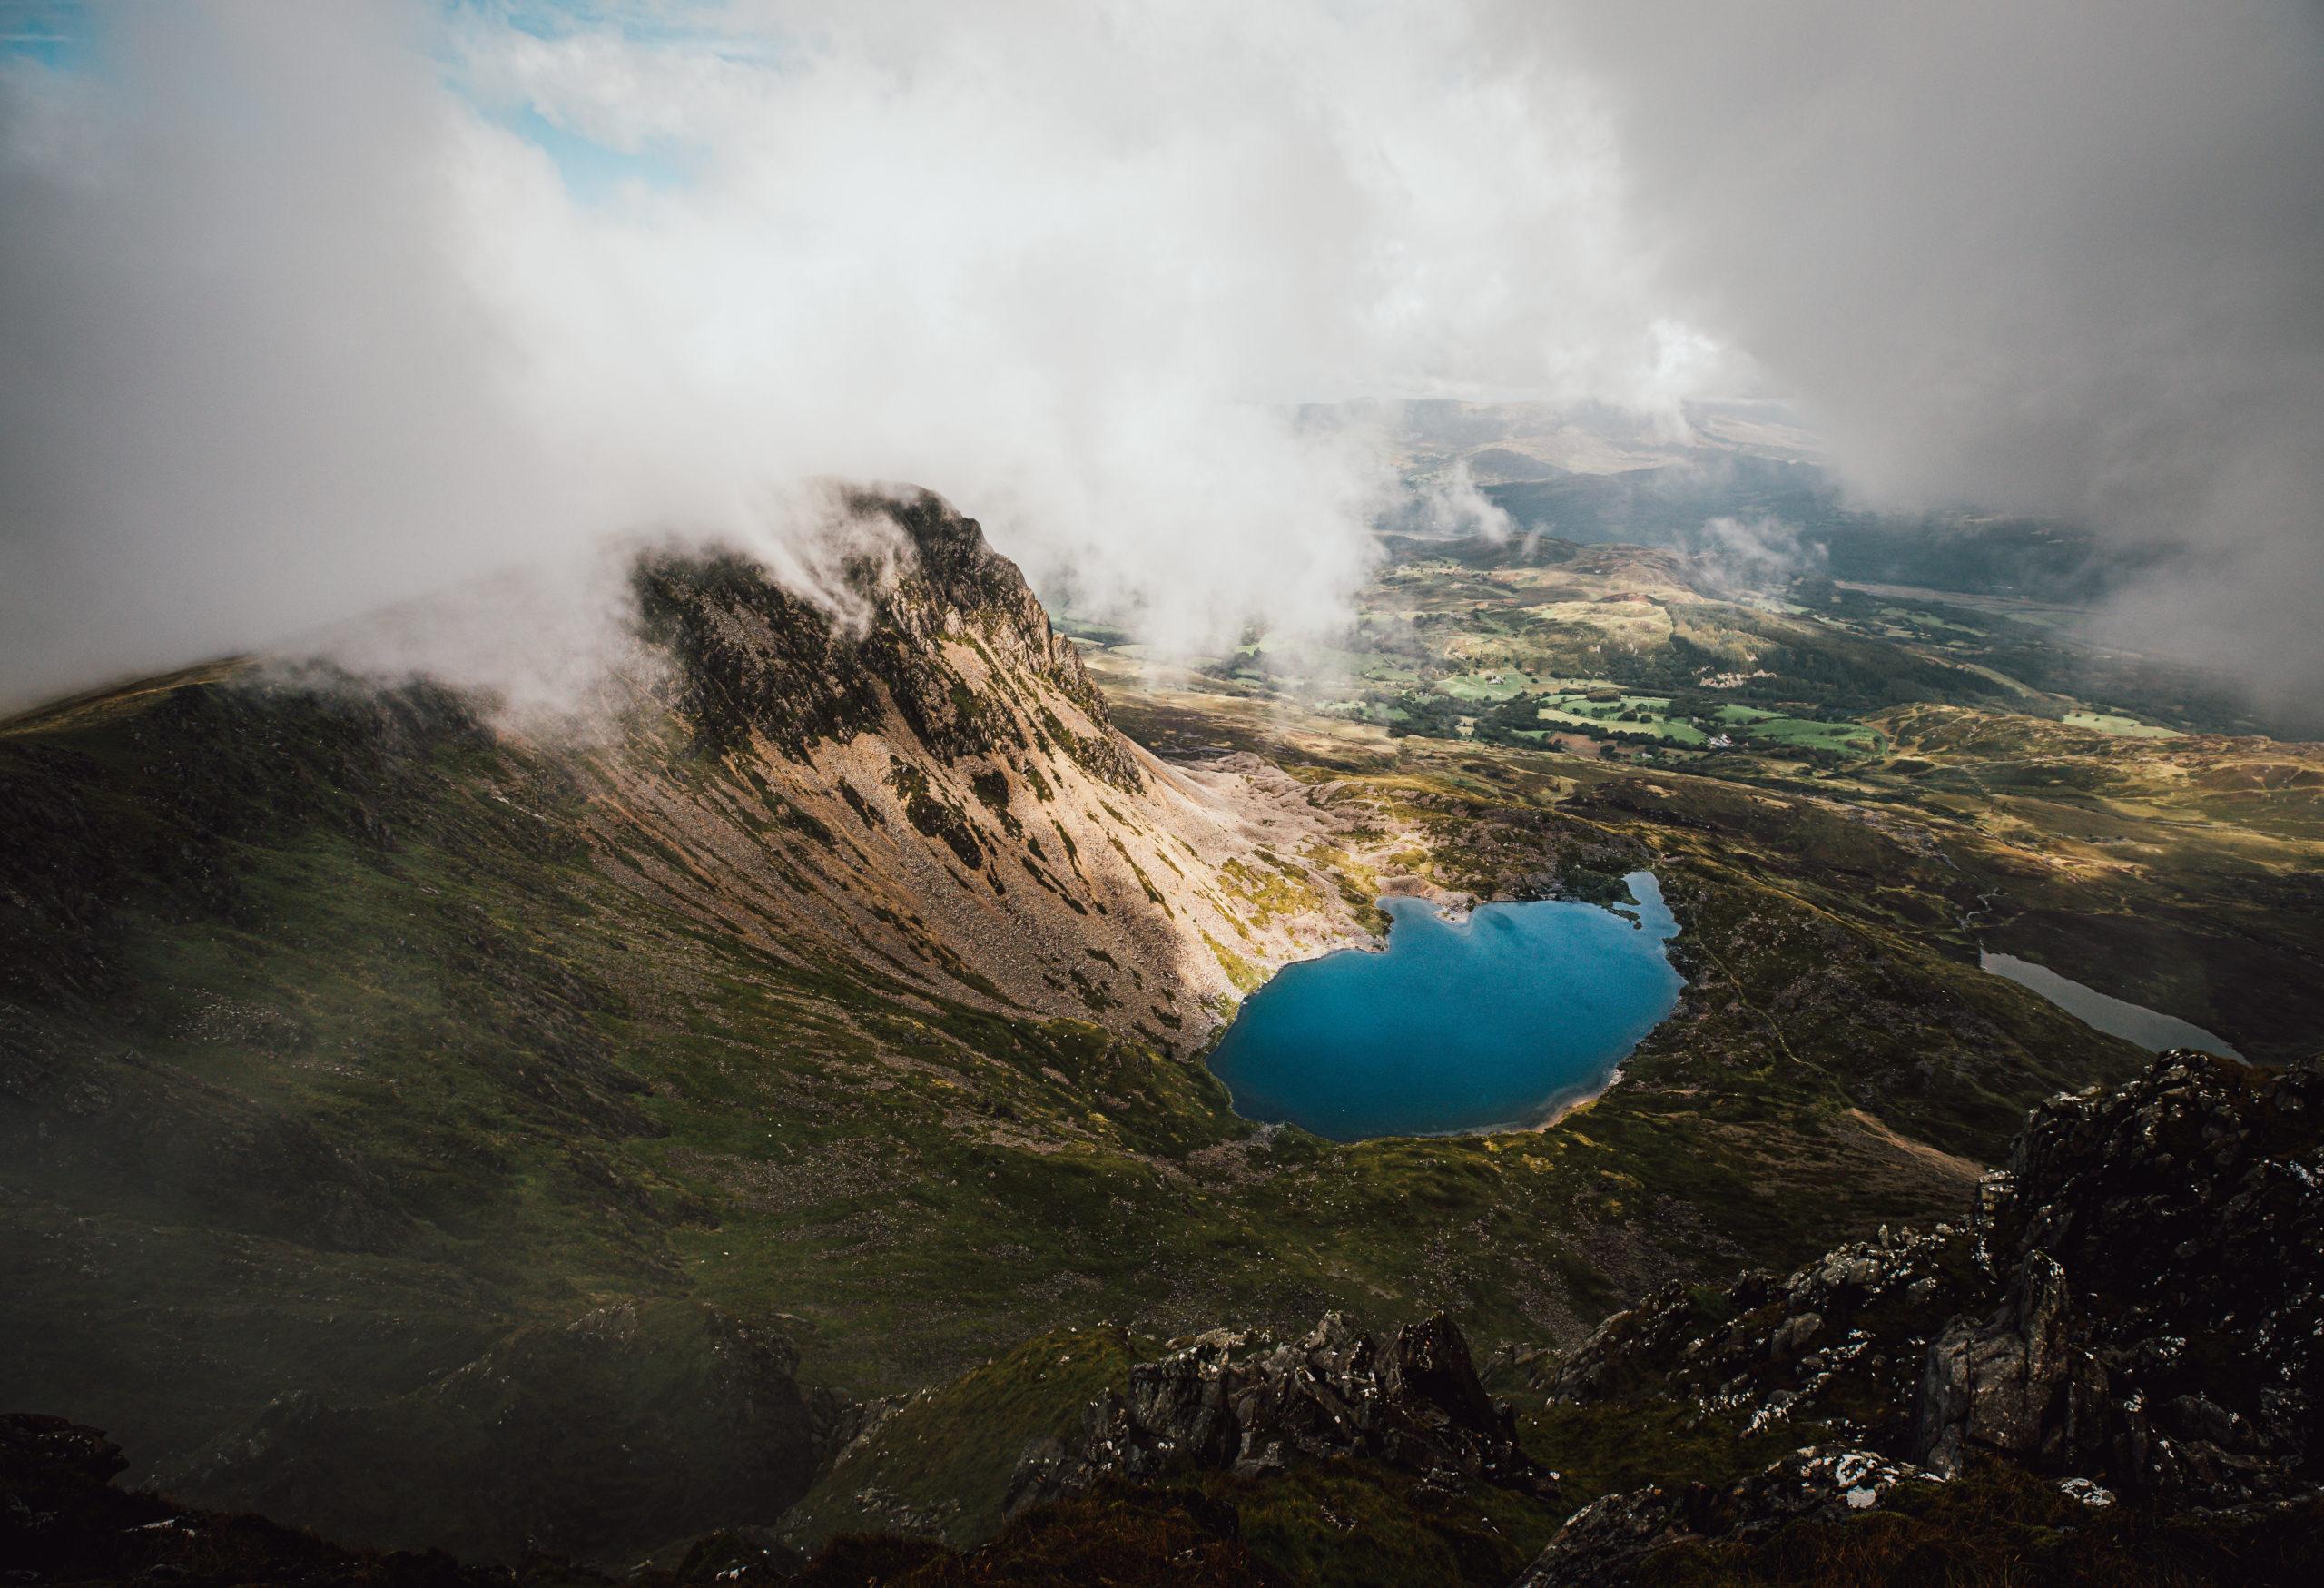 Snowdonias Berggipfel, Burgen & Feen